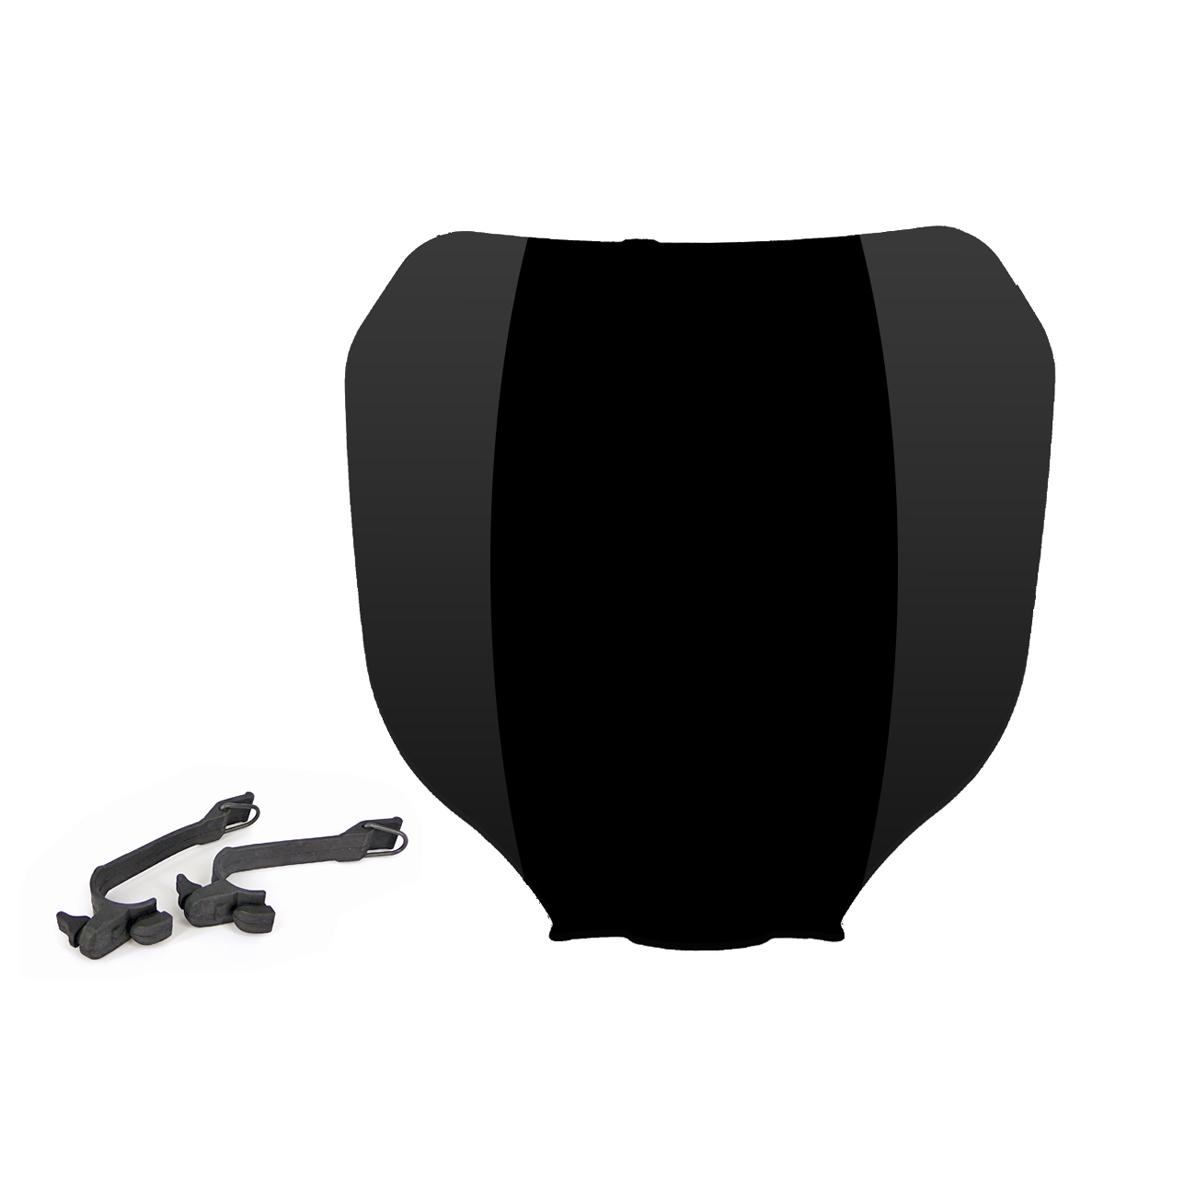 Tête de Fourche Cross - Noir